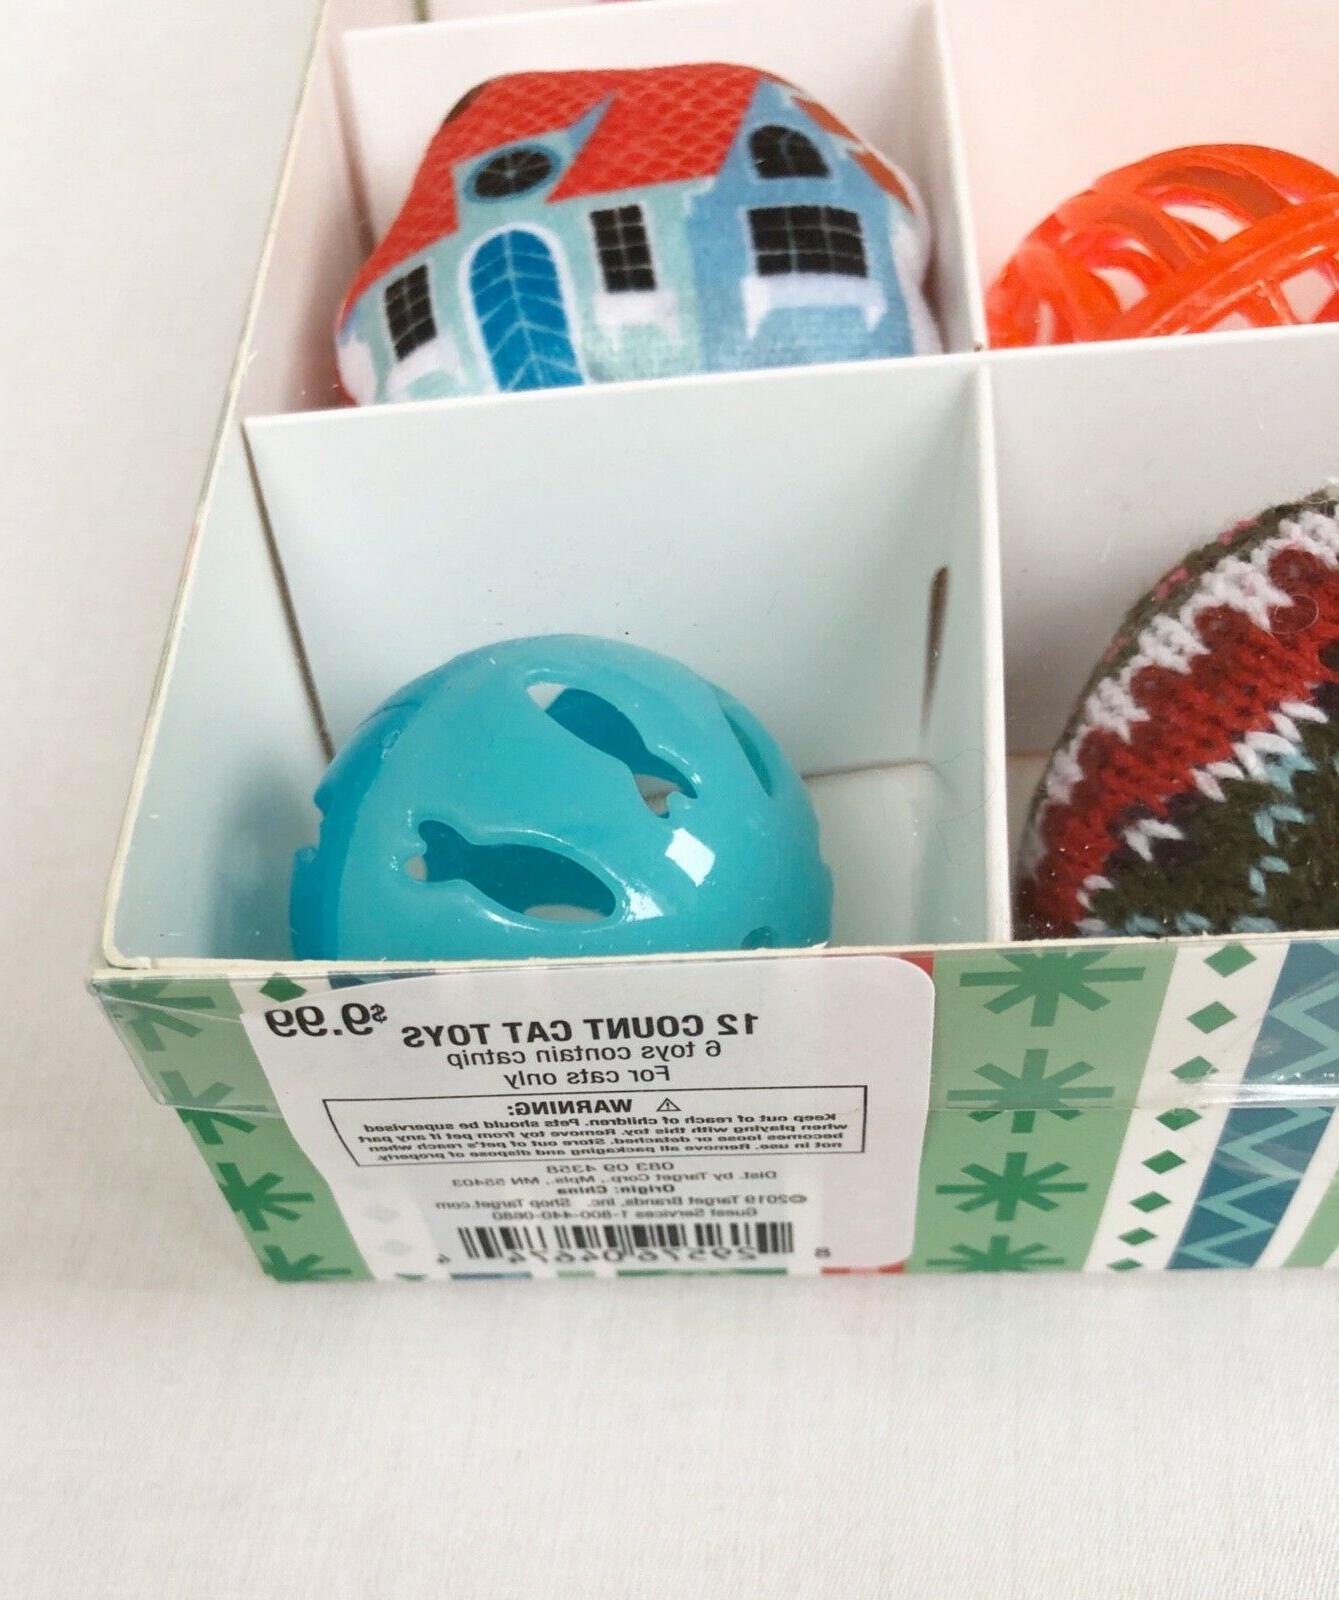 CAT TOYS CALENDAR Catnip Balls Bells Mice 12 Toys Box